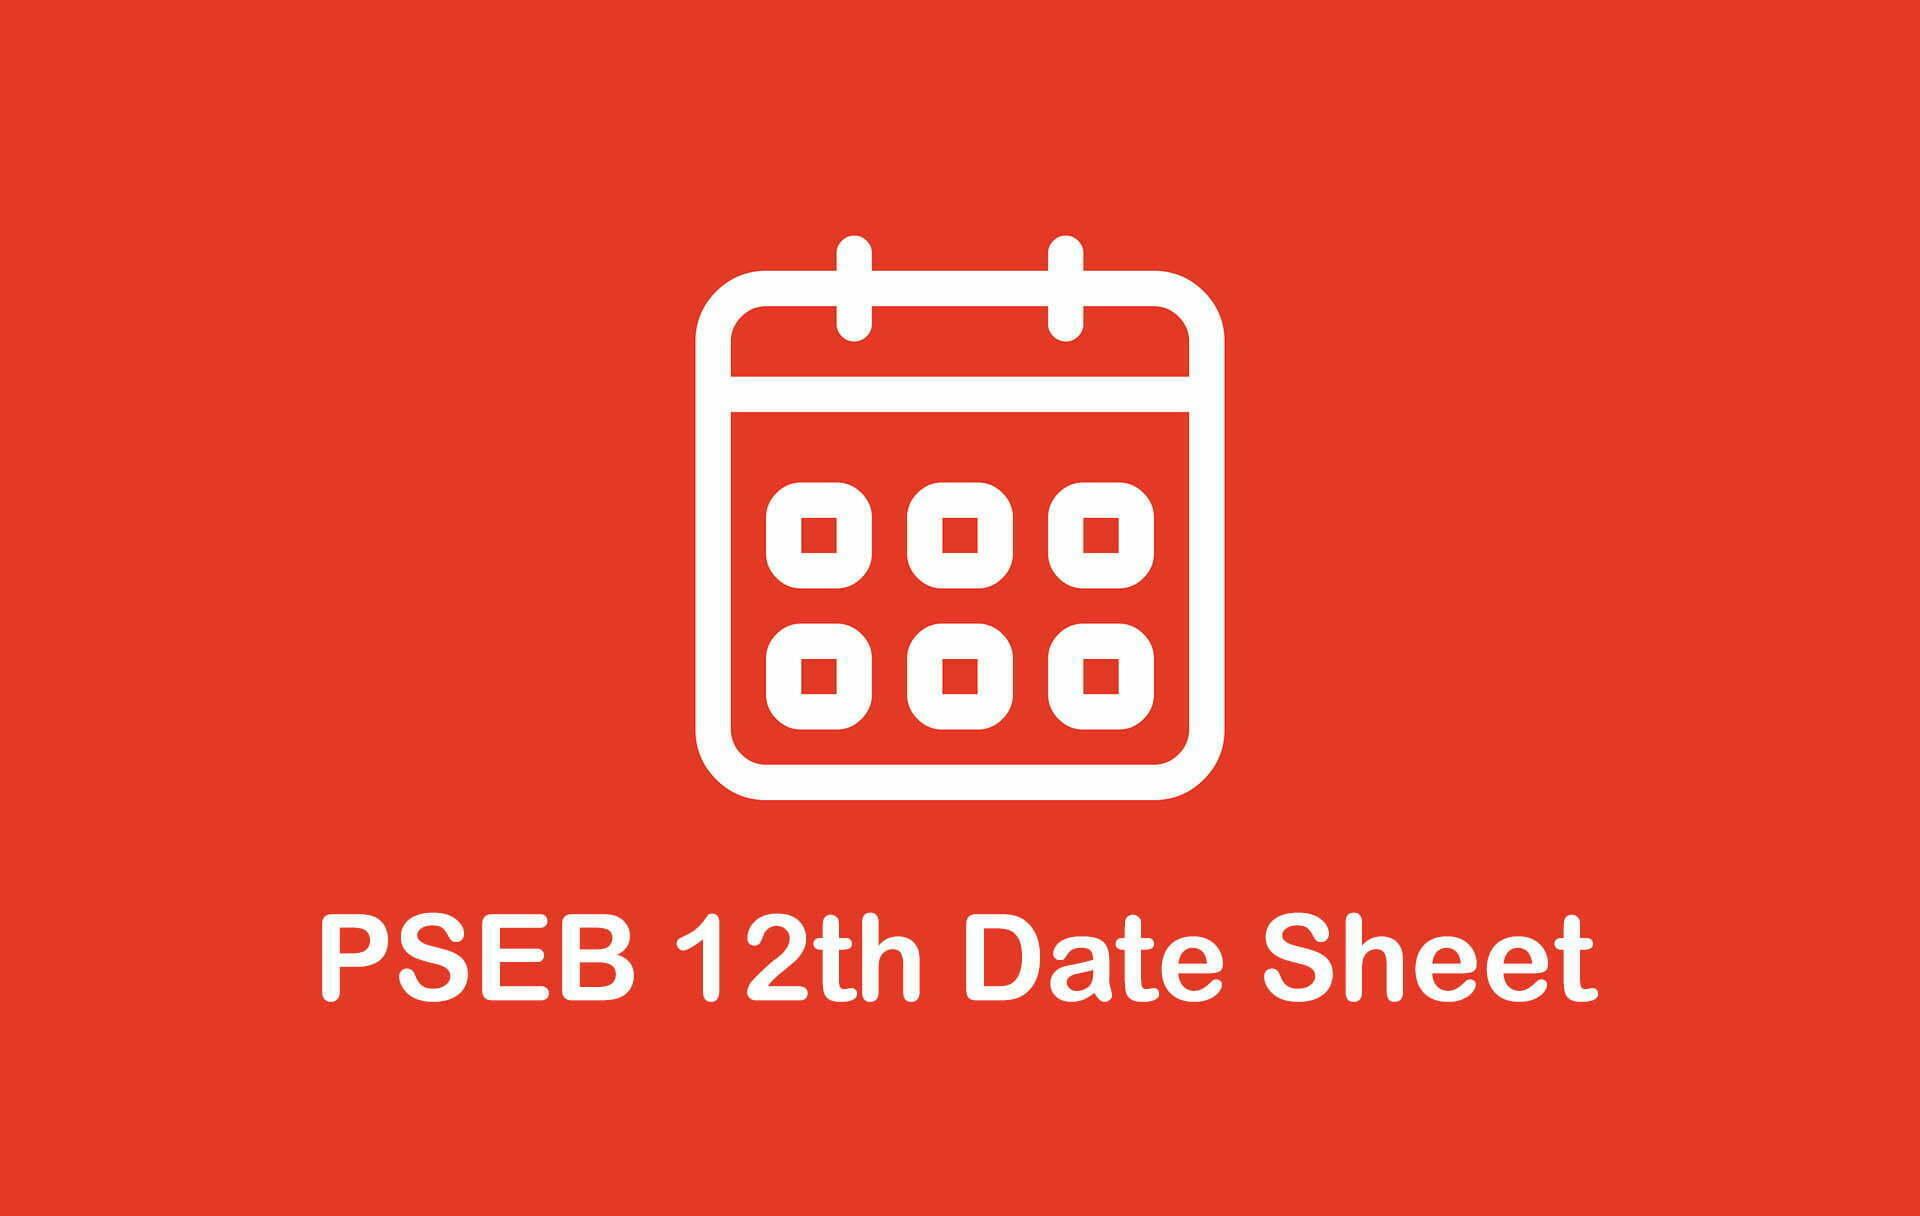 PSEB 12th Date Sheet